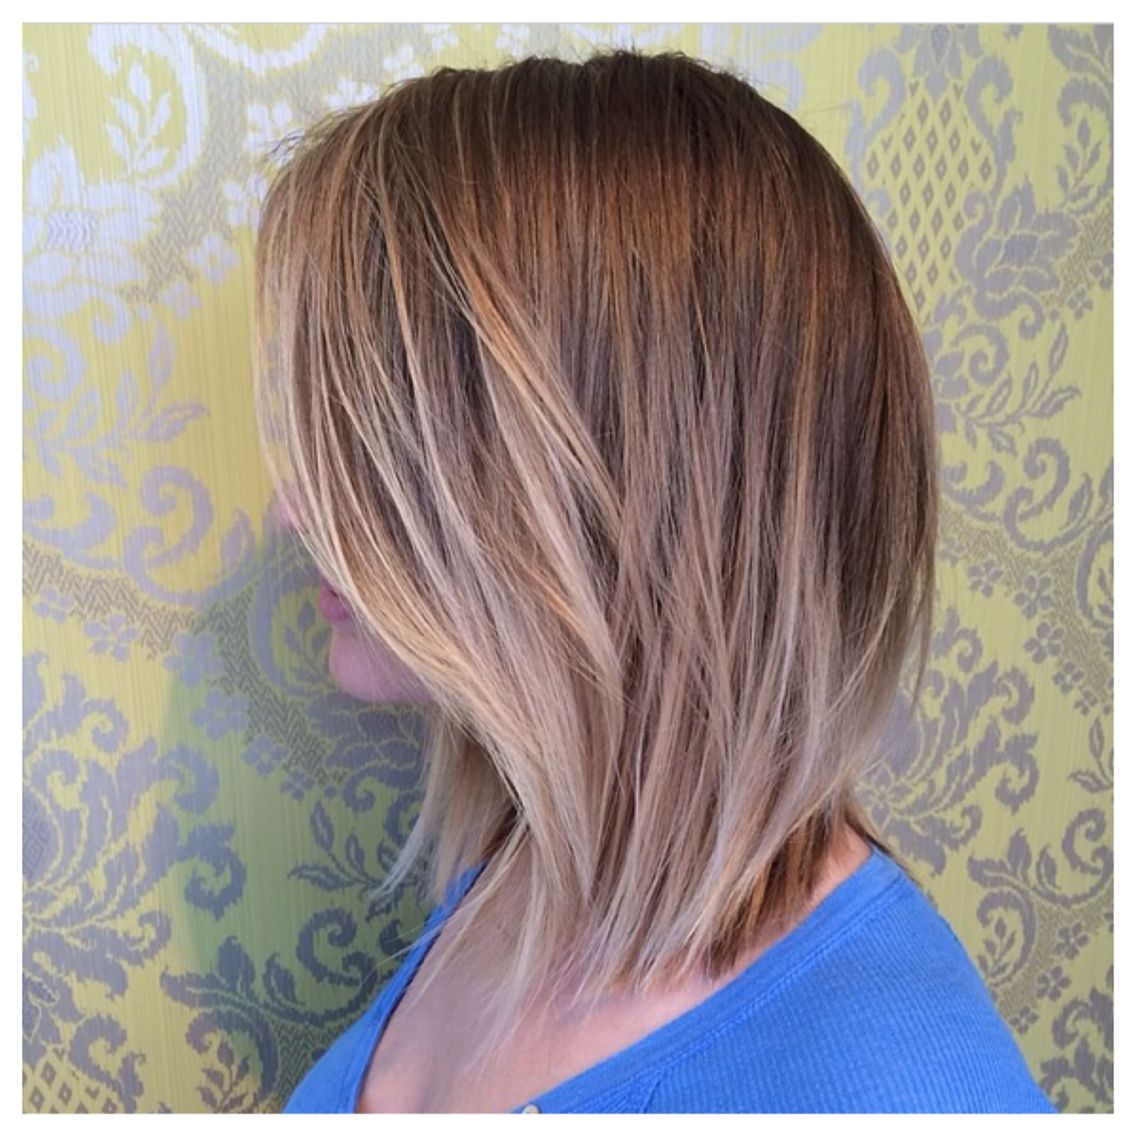 Color U0026 Cut By Chrissy Reiff At PARLOUR Cincinnati #hair #davines  #sunkissed #